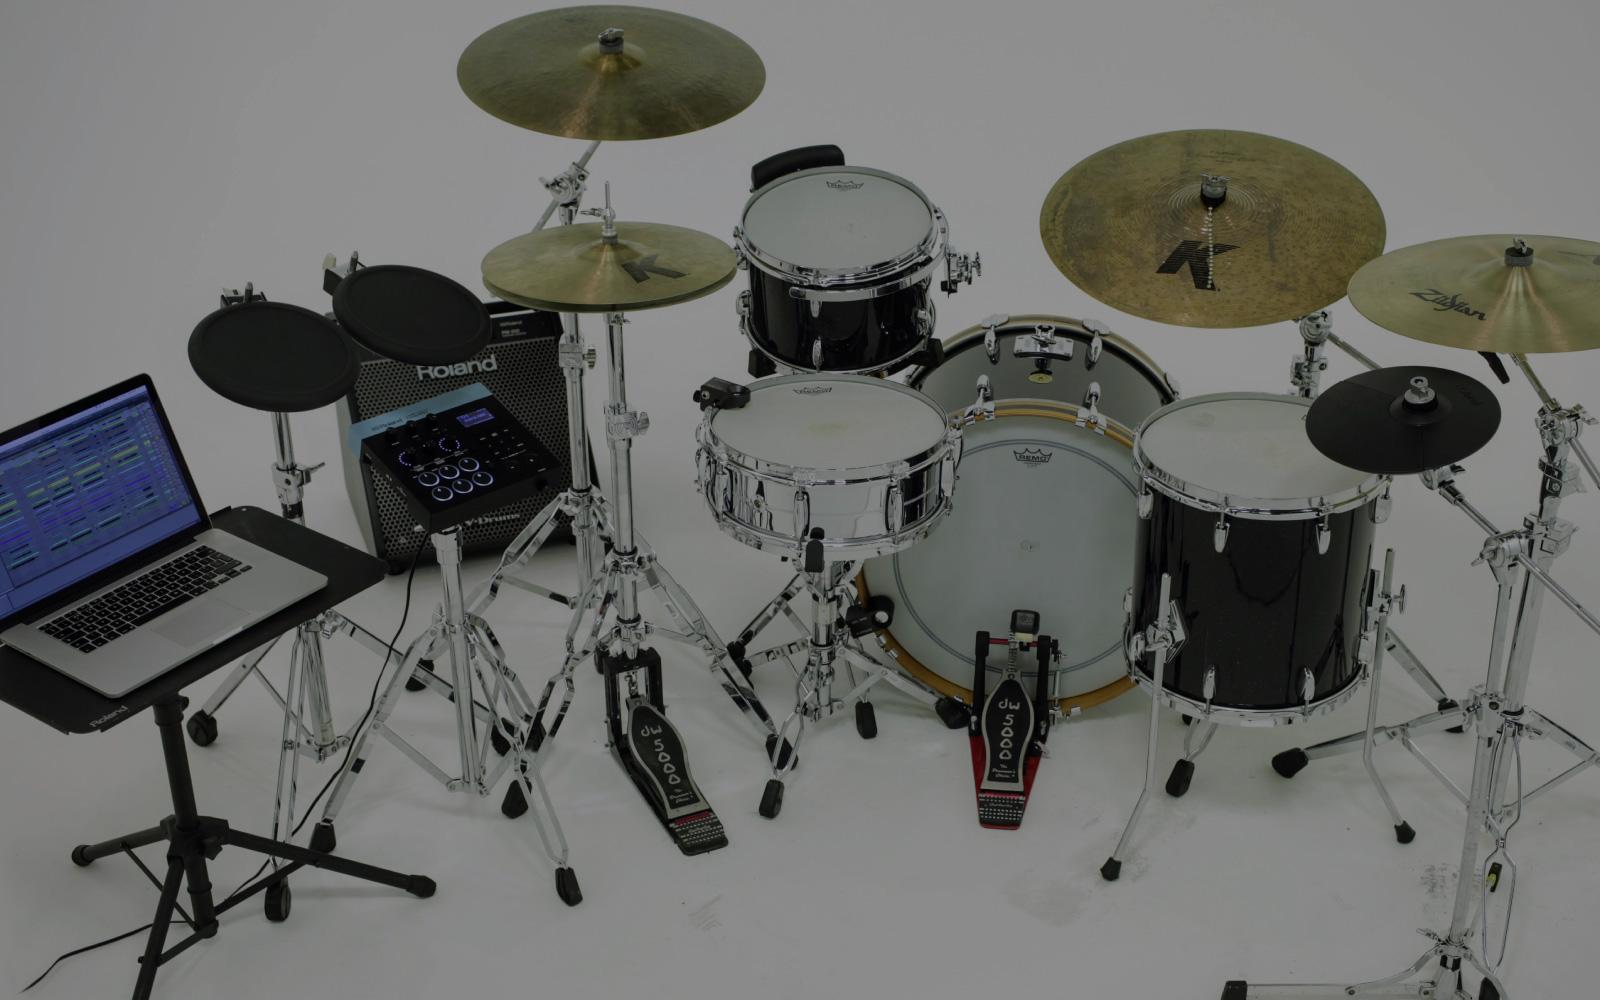 Roland Hybrid Drums Piece Drum Set Diagram My Tama Before I Full Fledged System